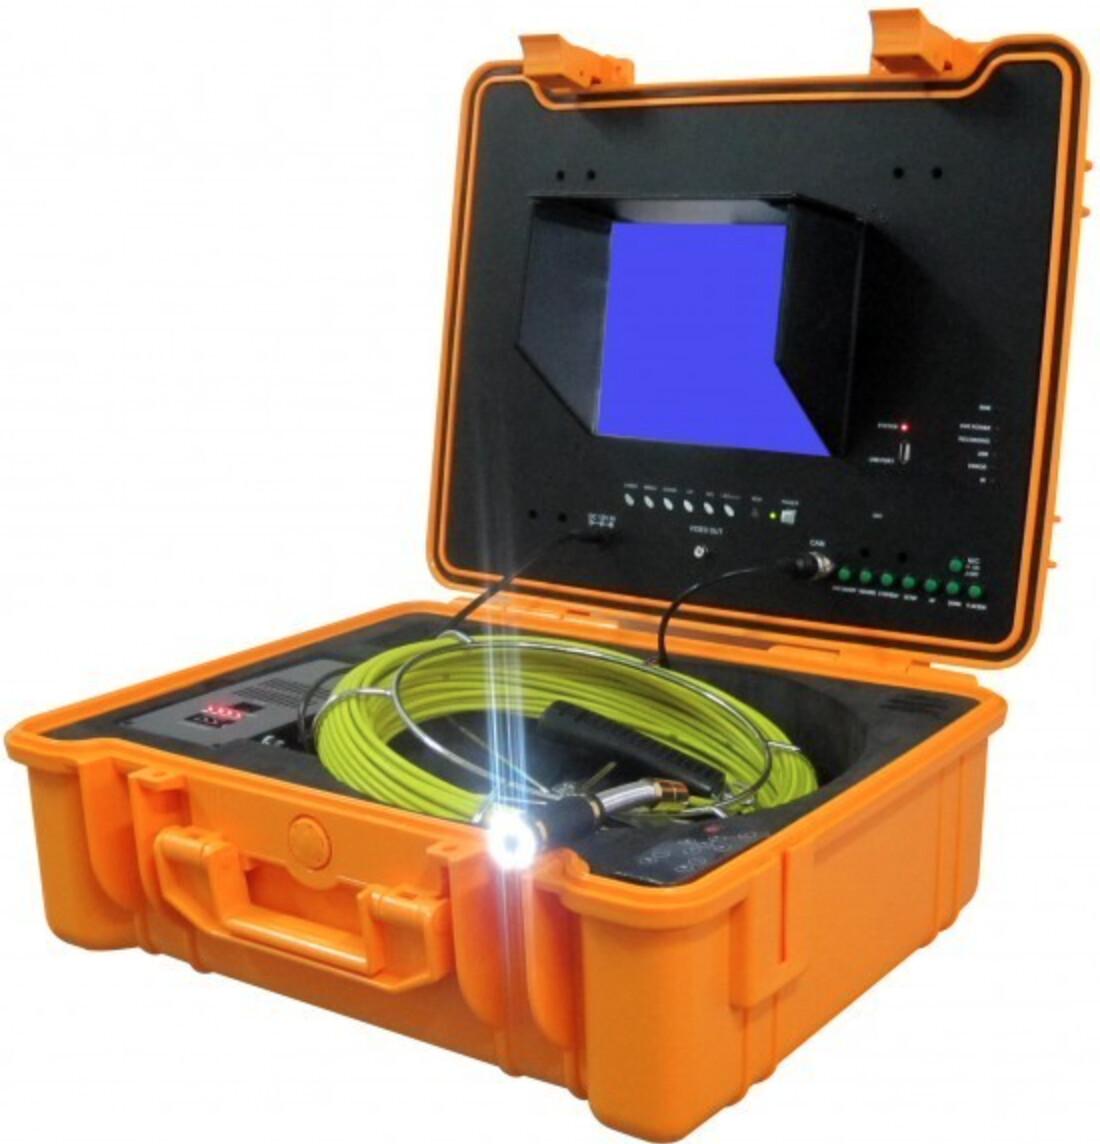 Система видеодиагностики Крокочист 50663-40